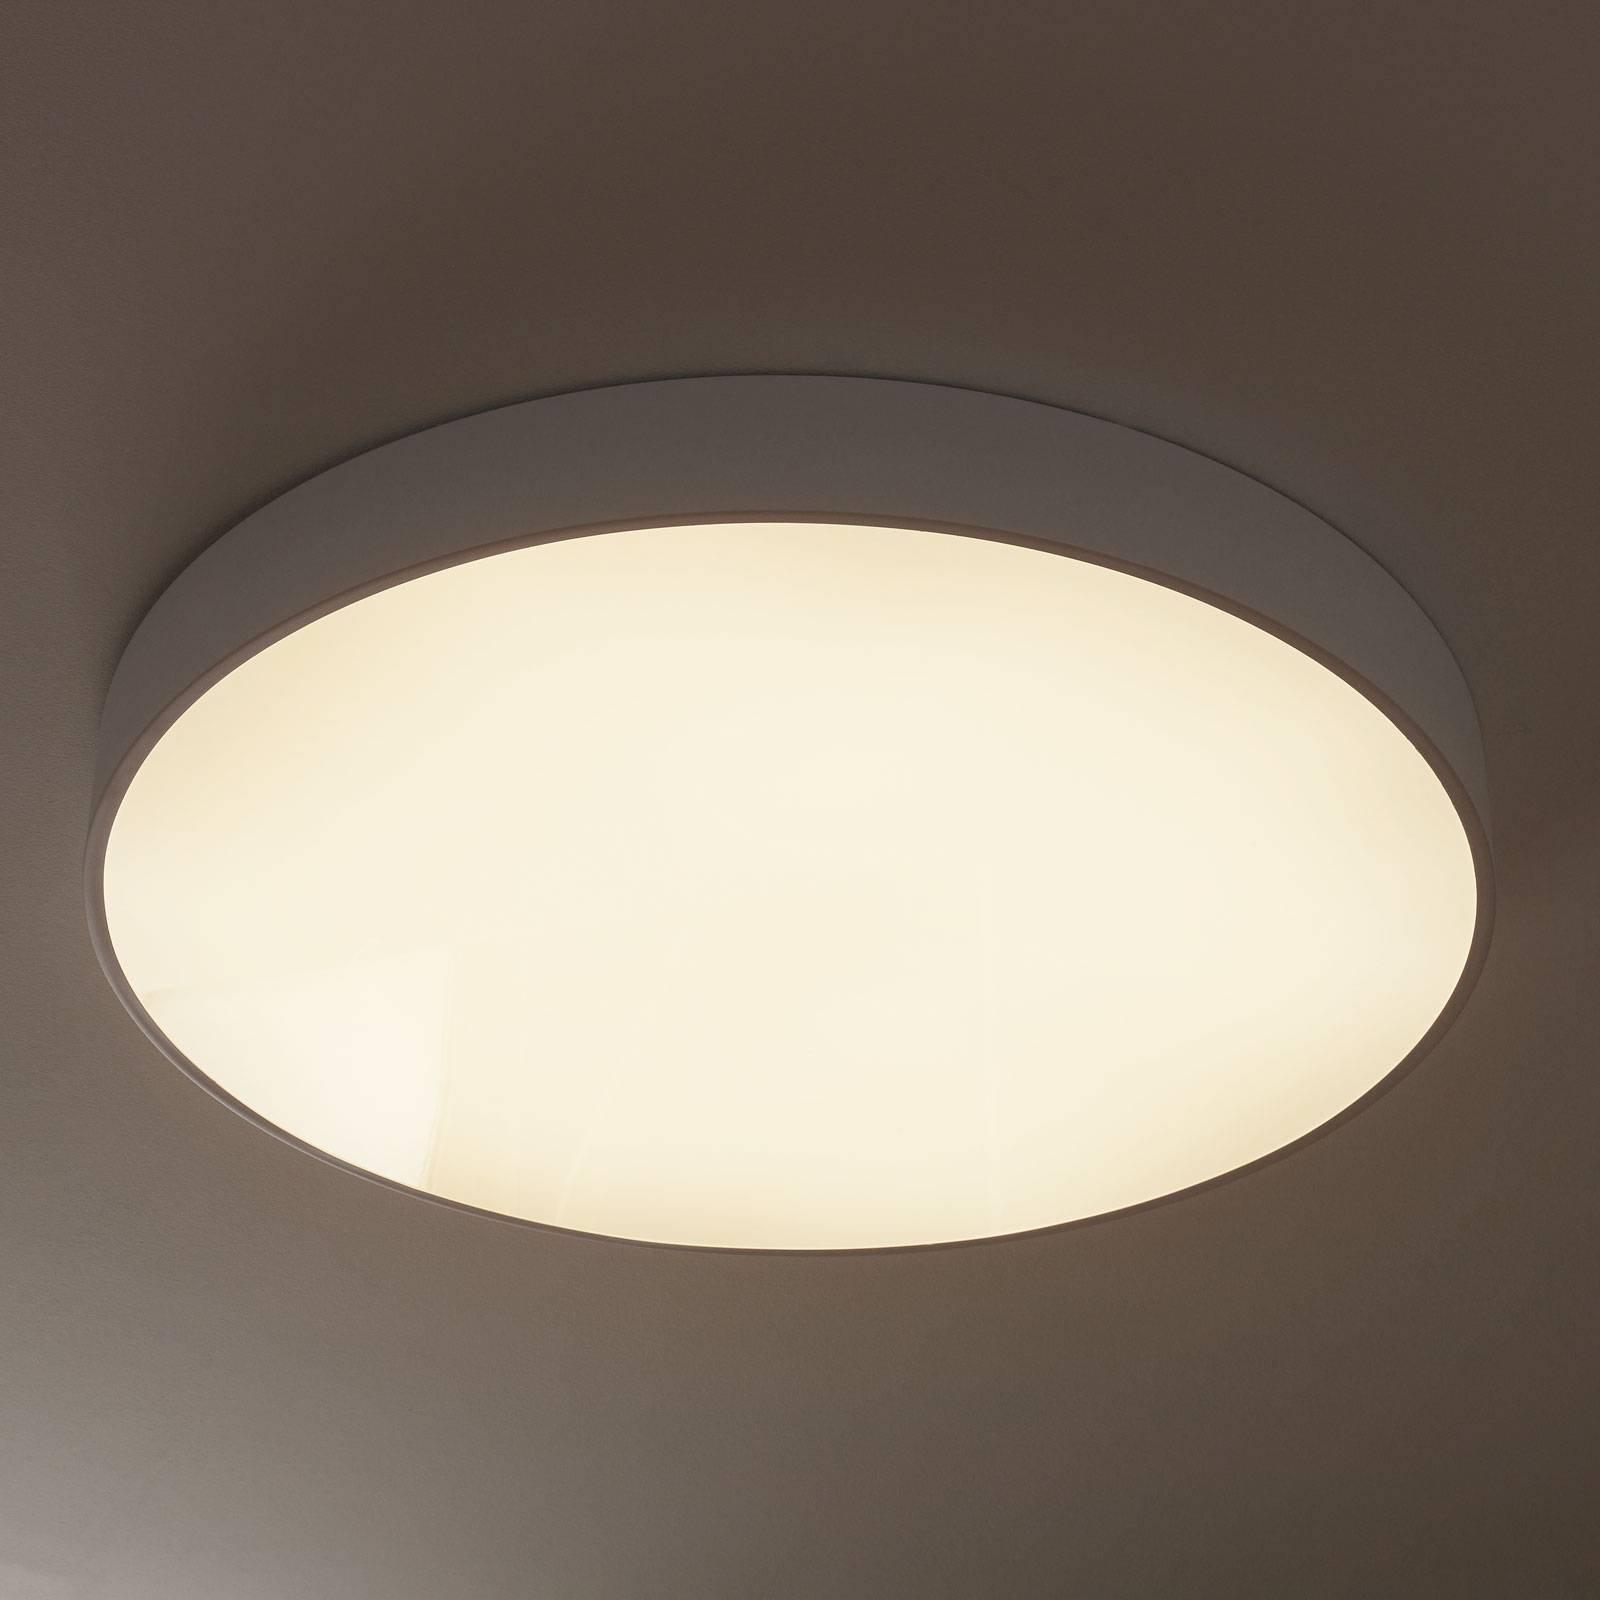 Isia - dimbart LED-taklampe, Ø 100 cm